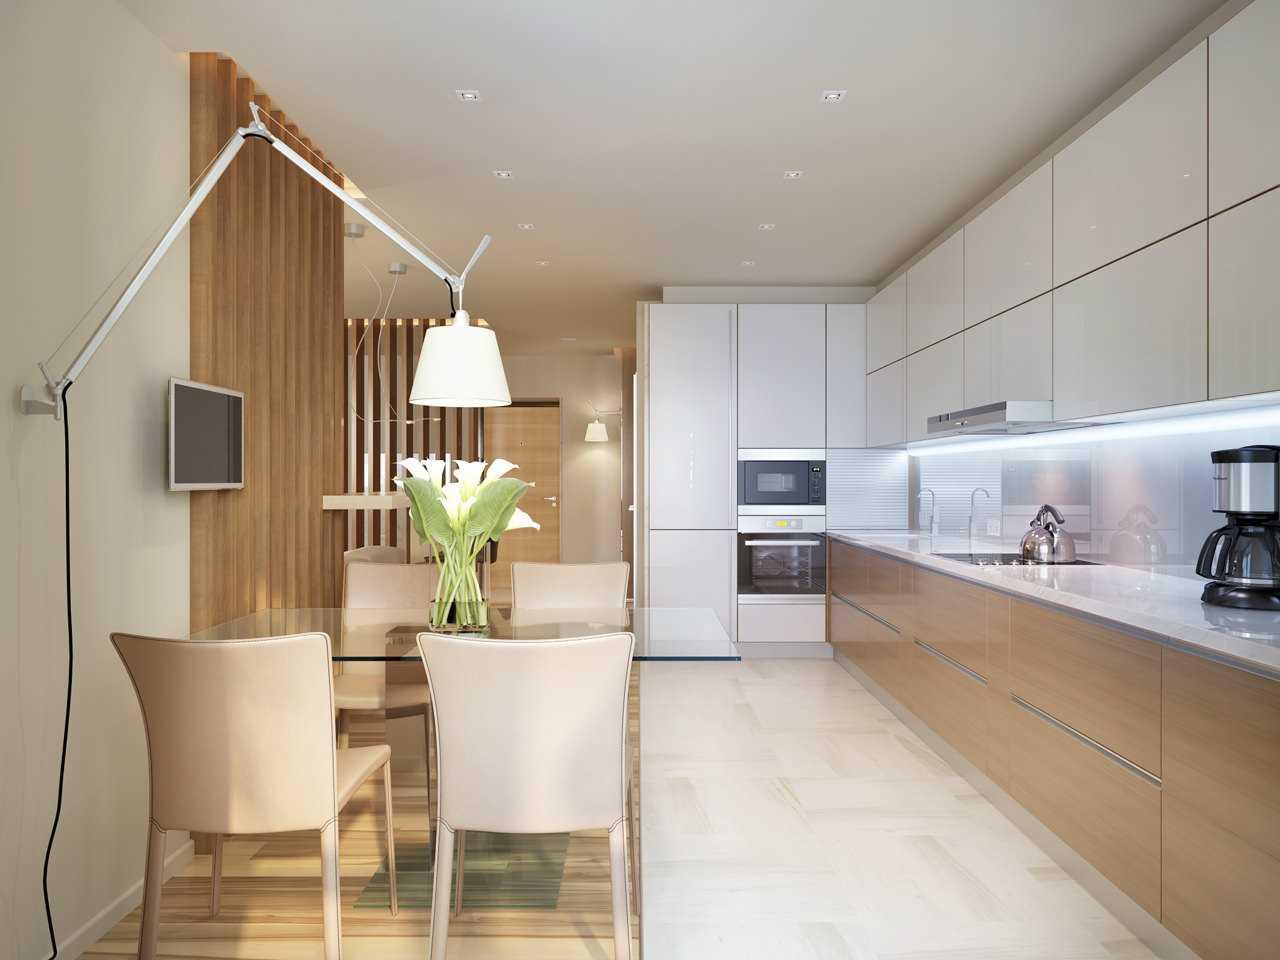 cucina-moderna-rettangolare-idee-6